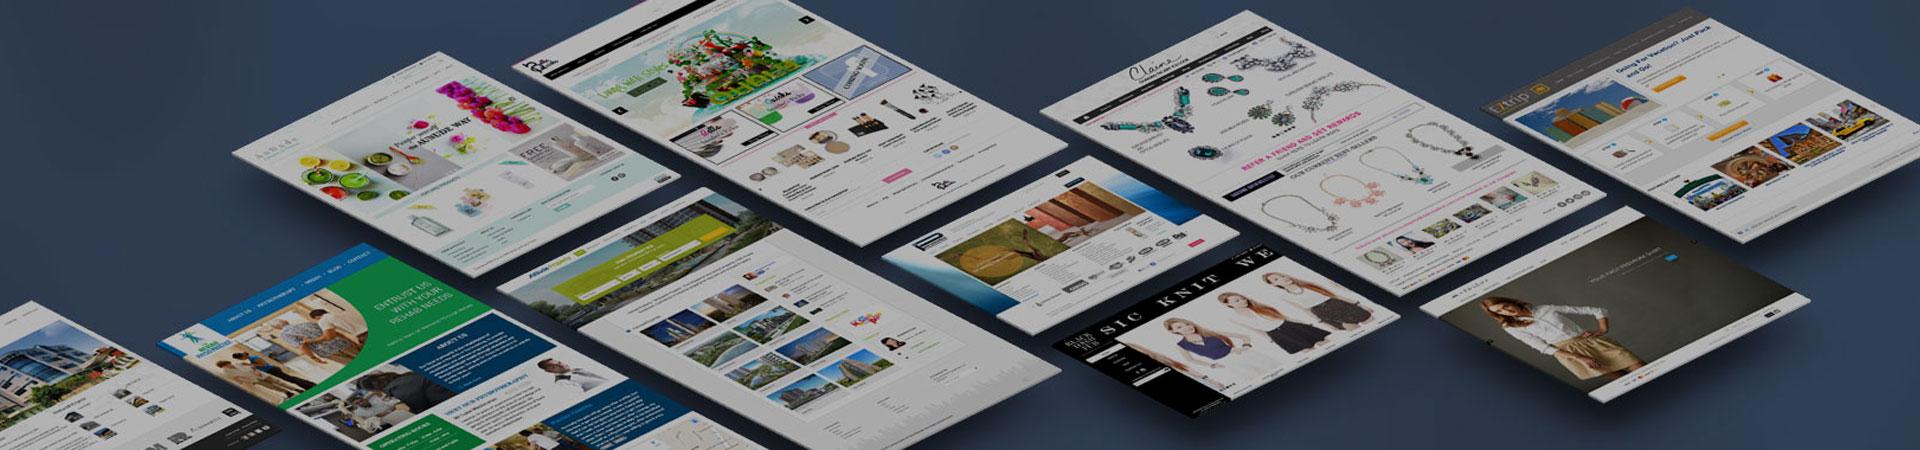 Website Design Singapore - Oxti